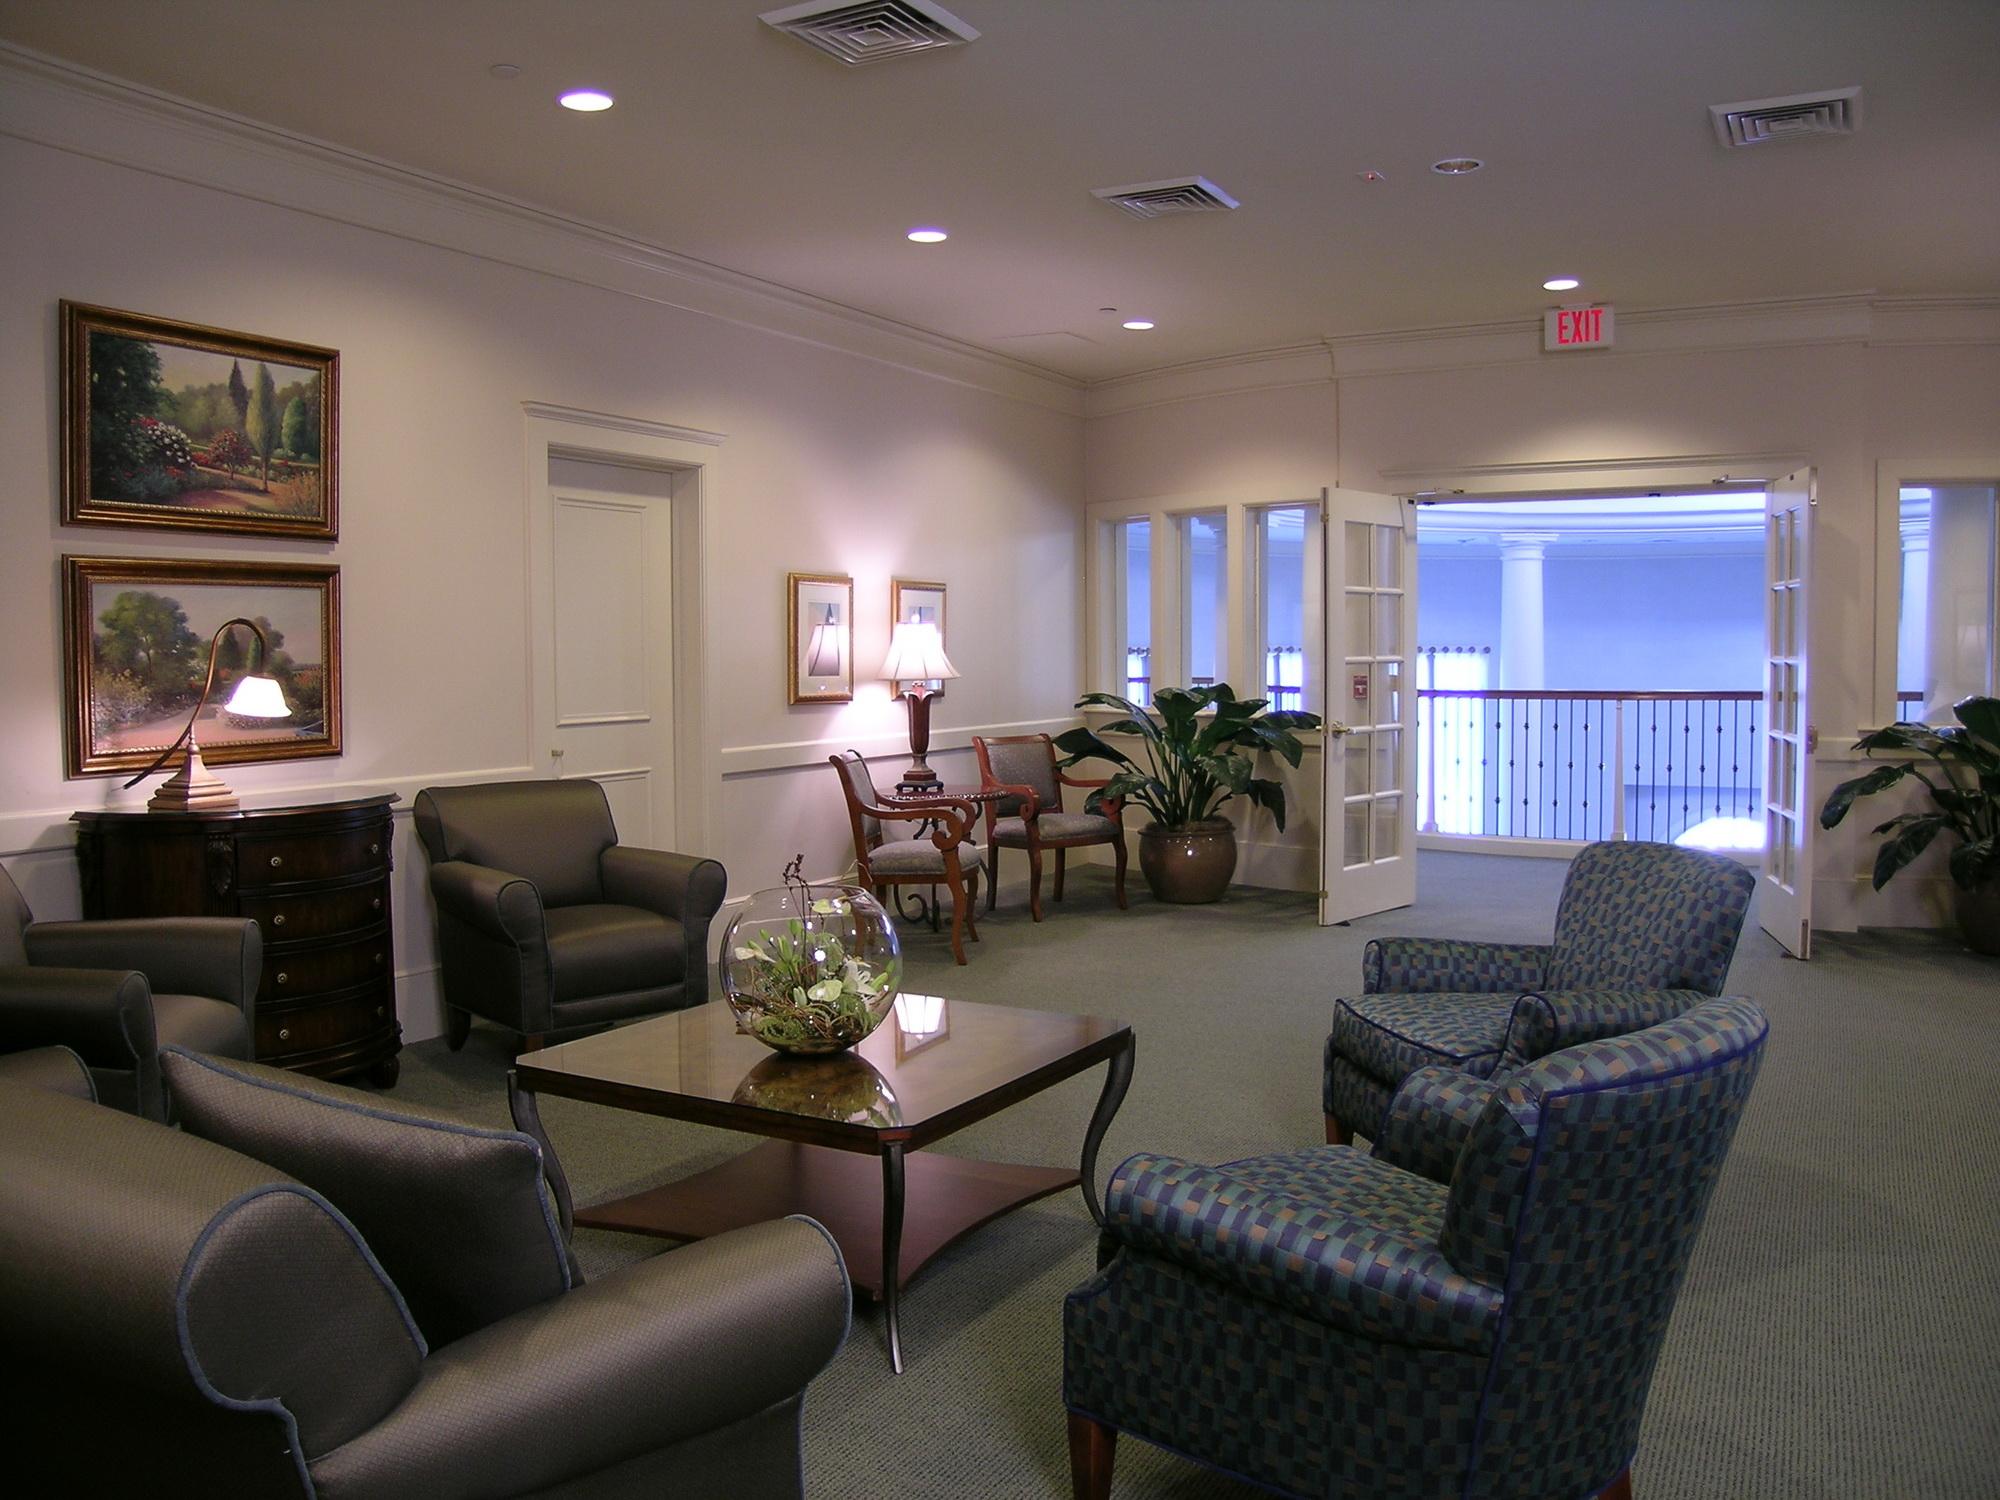 Funeral home decor ideas - Modern funeral home interior design ...